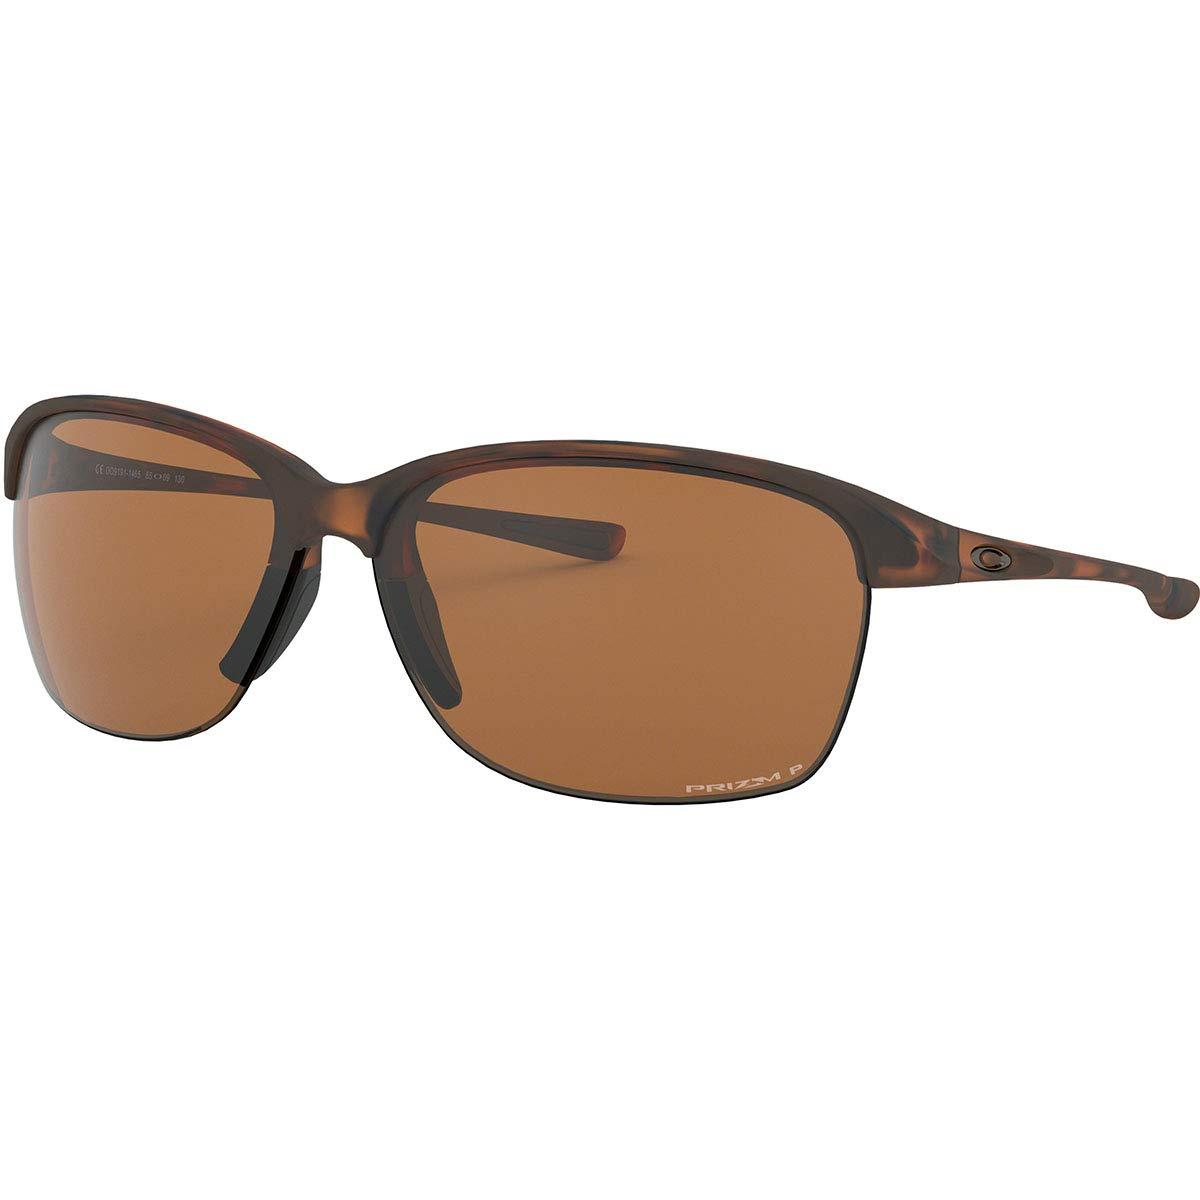 Oakley Women's OO9191 Unstoppable Rectangular Sunglasses, Matte Brown Tortoise/Prizm Tungsten Polarized, 65 mm by Oakley